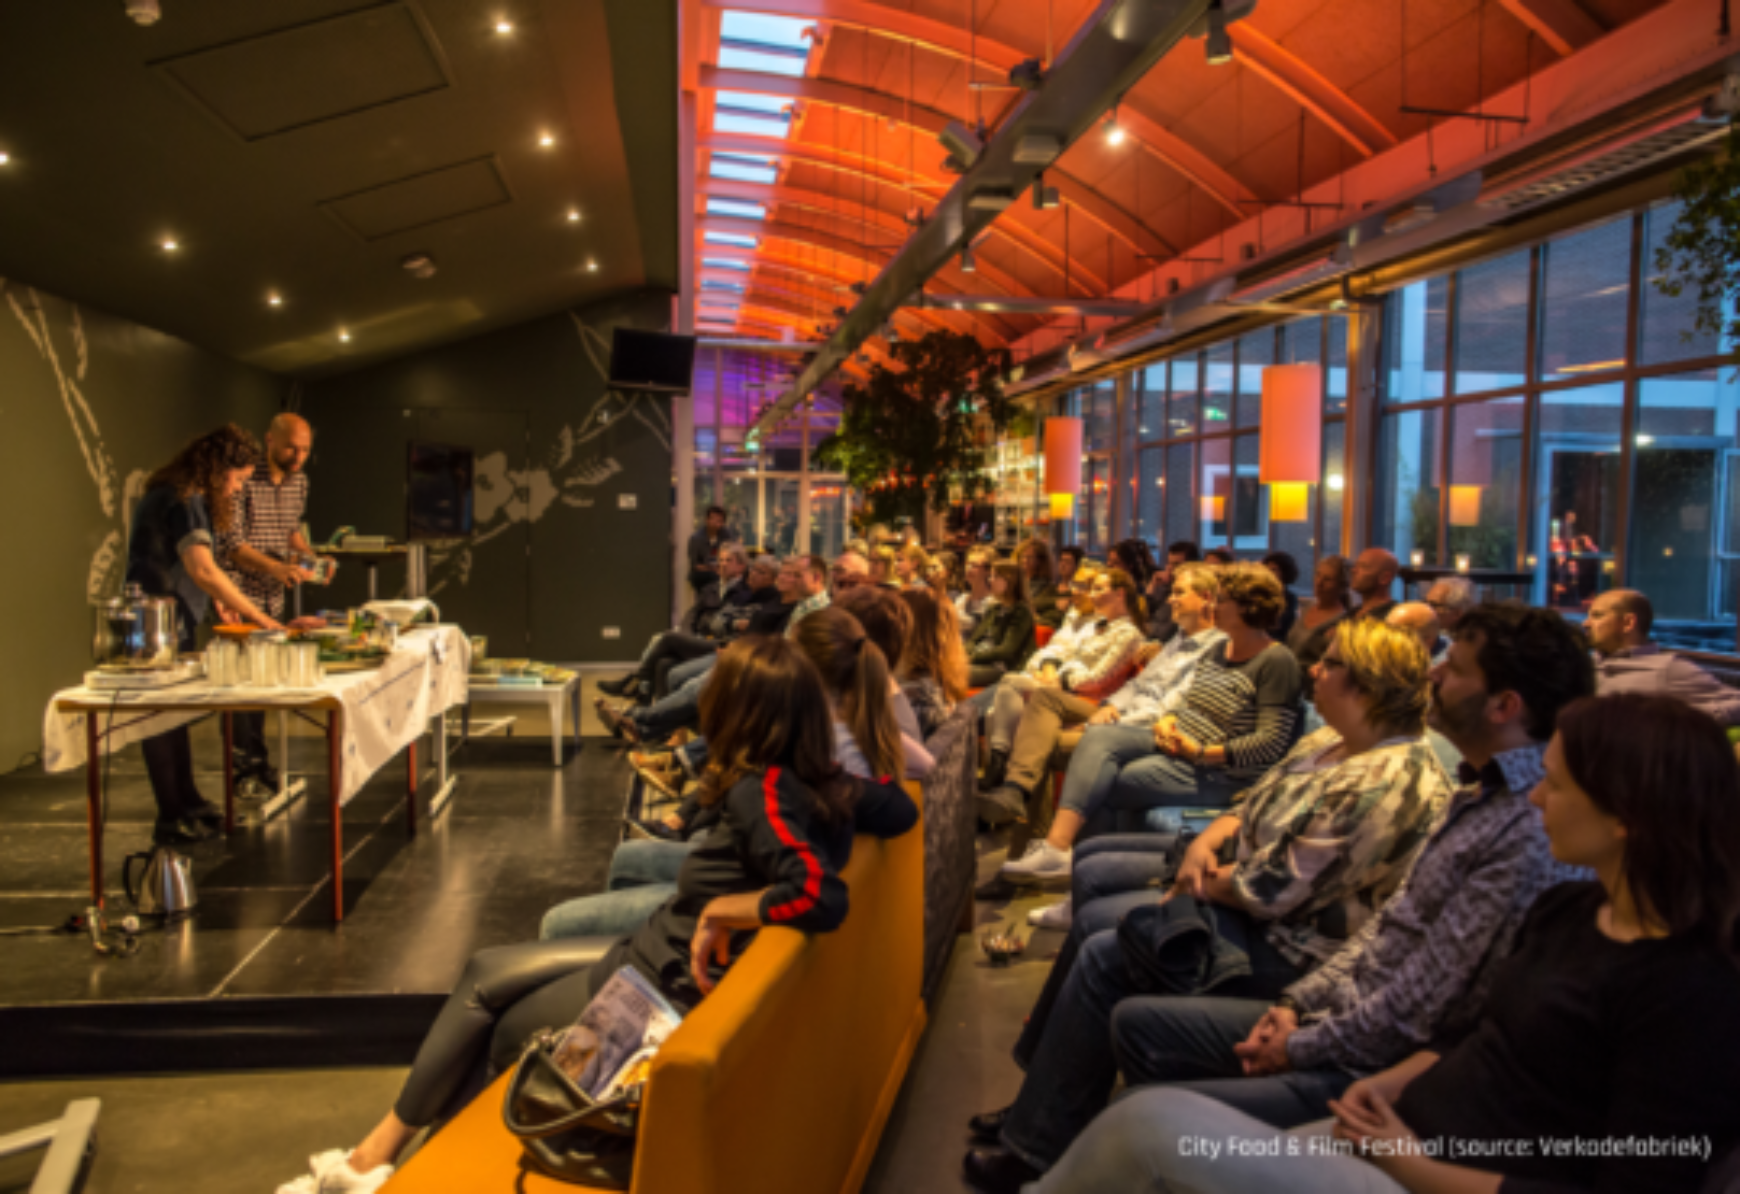 Spanish magazine Buenavida highlights North Brabant as European Region of Gastronomy 2018